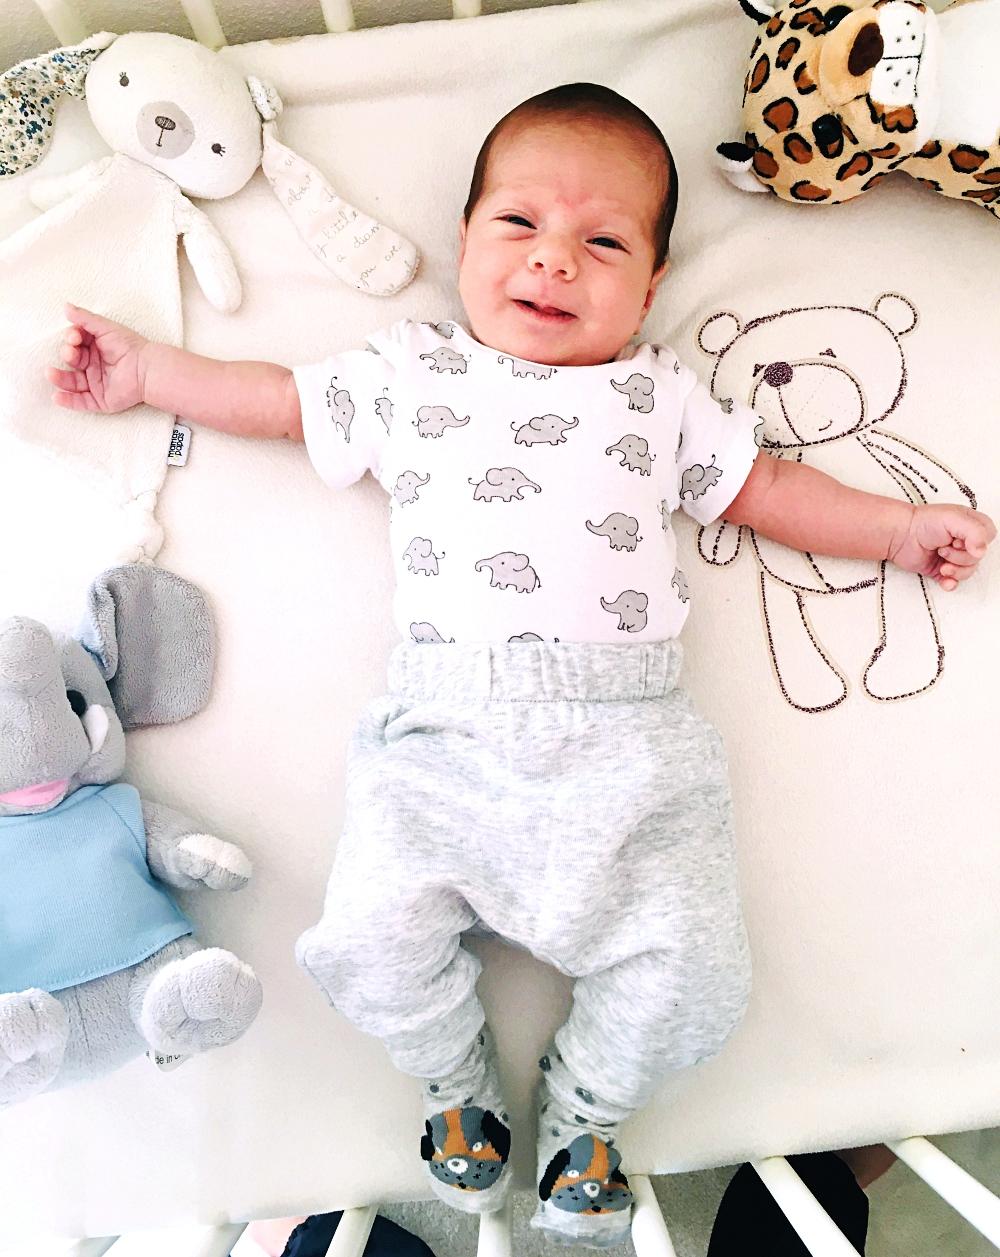 H&M Kids odeca za bebe i decu, beba decko model, odeca za decake bebe